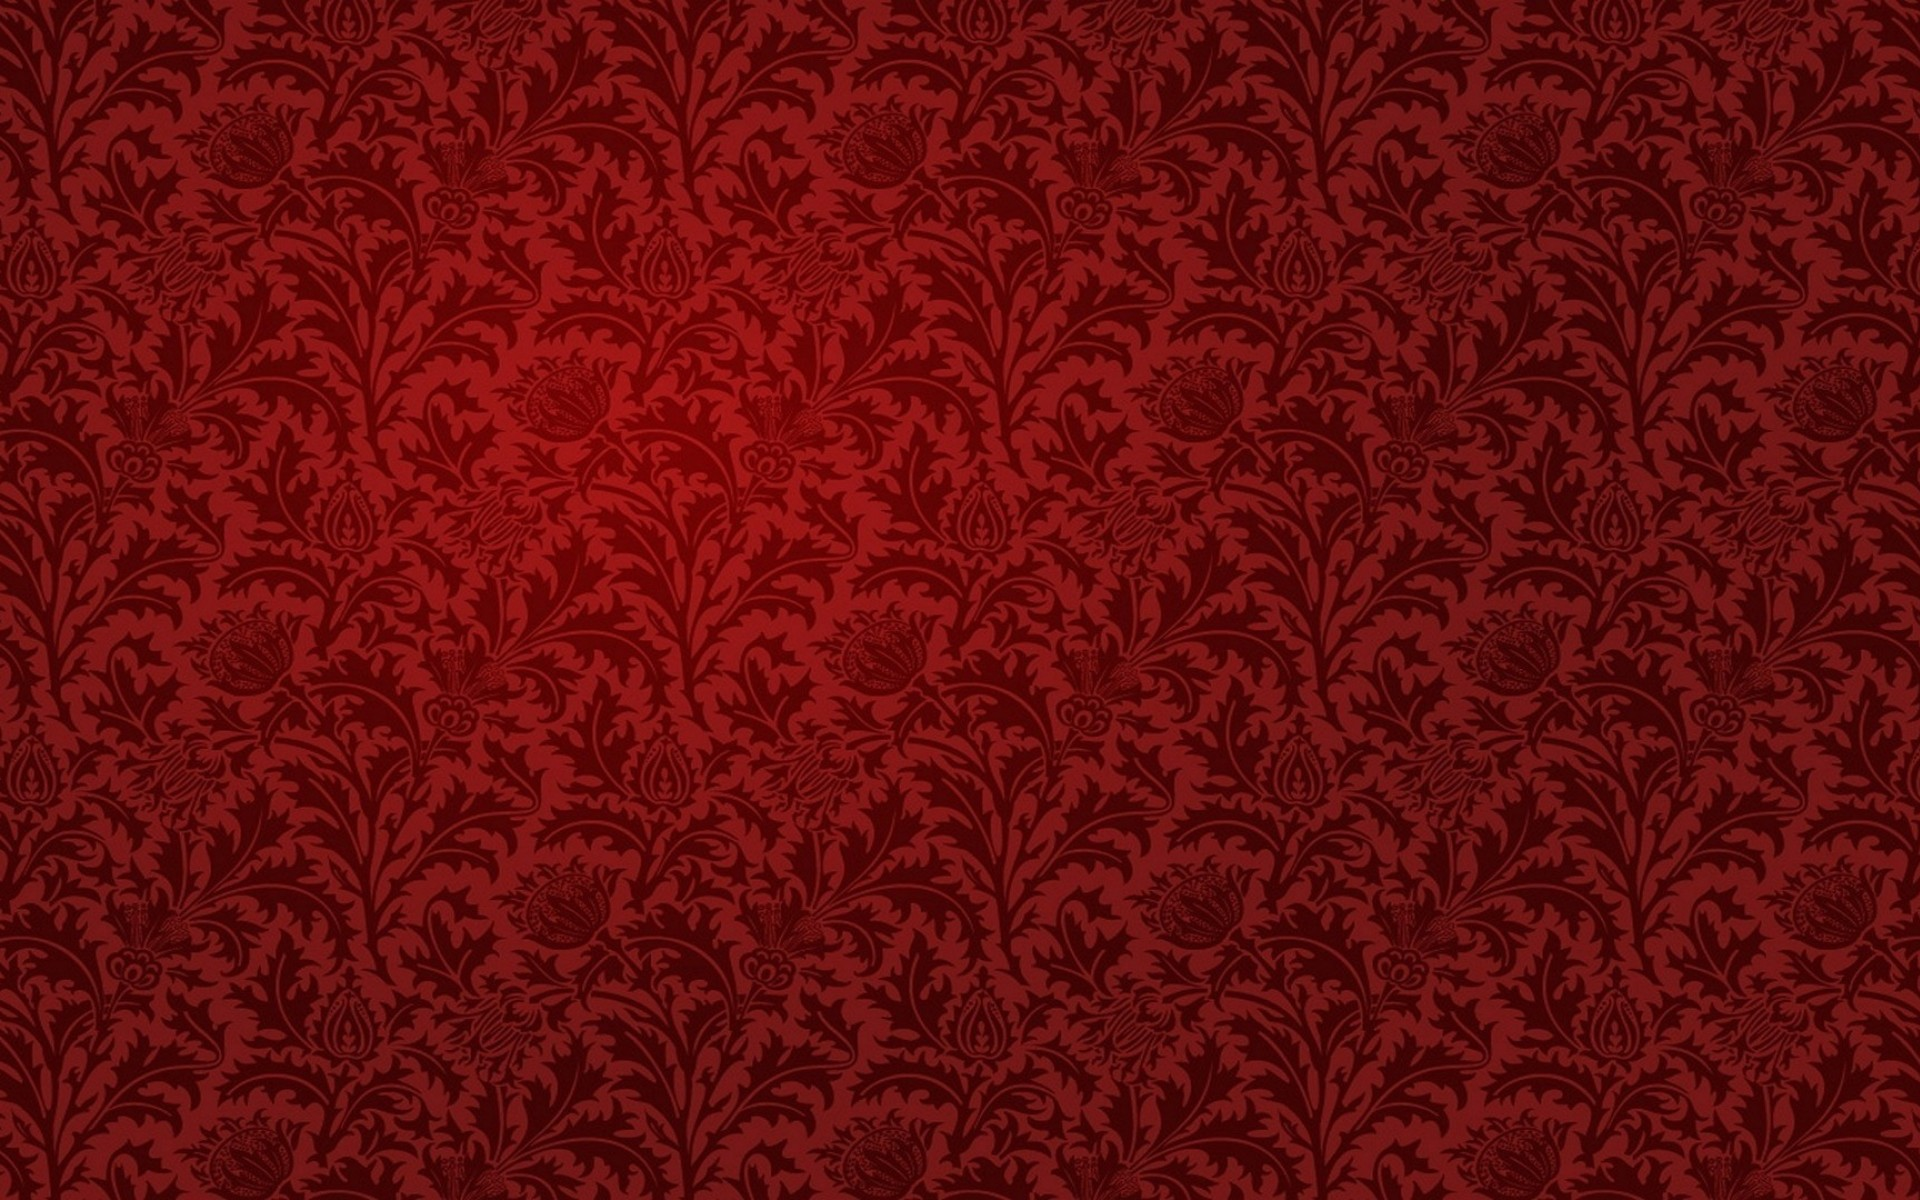 Red Damask Pattern Hd Wallpaper Wallpaper List 1920x1200